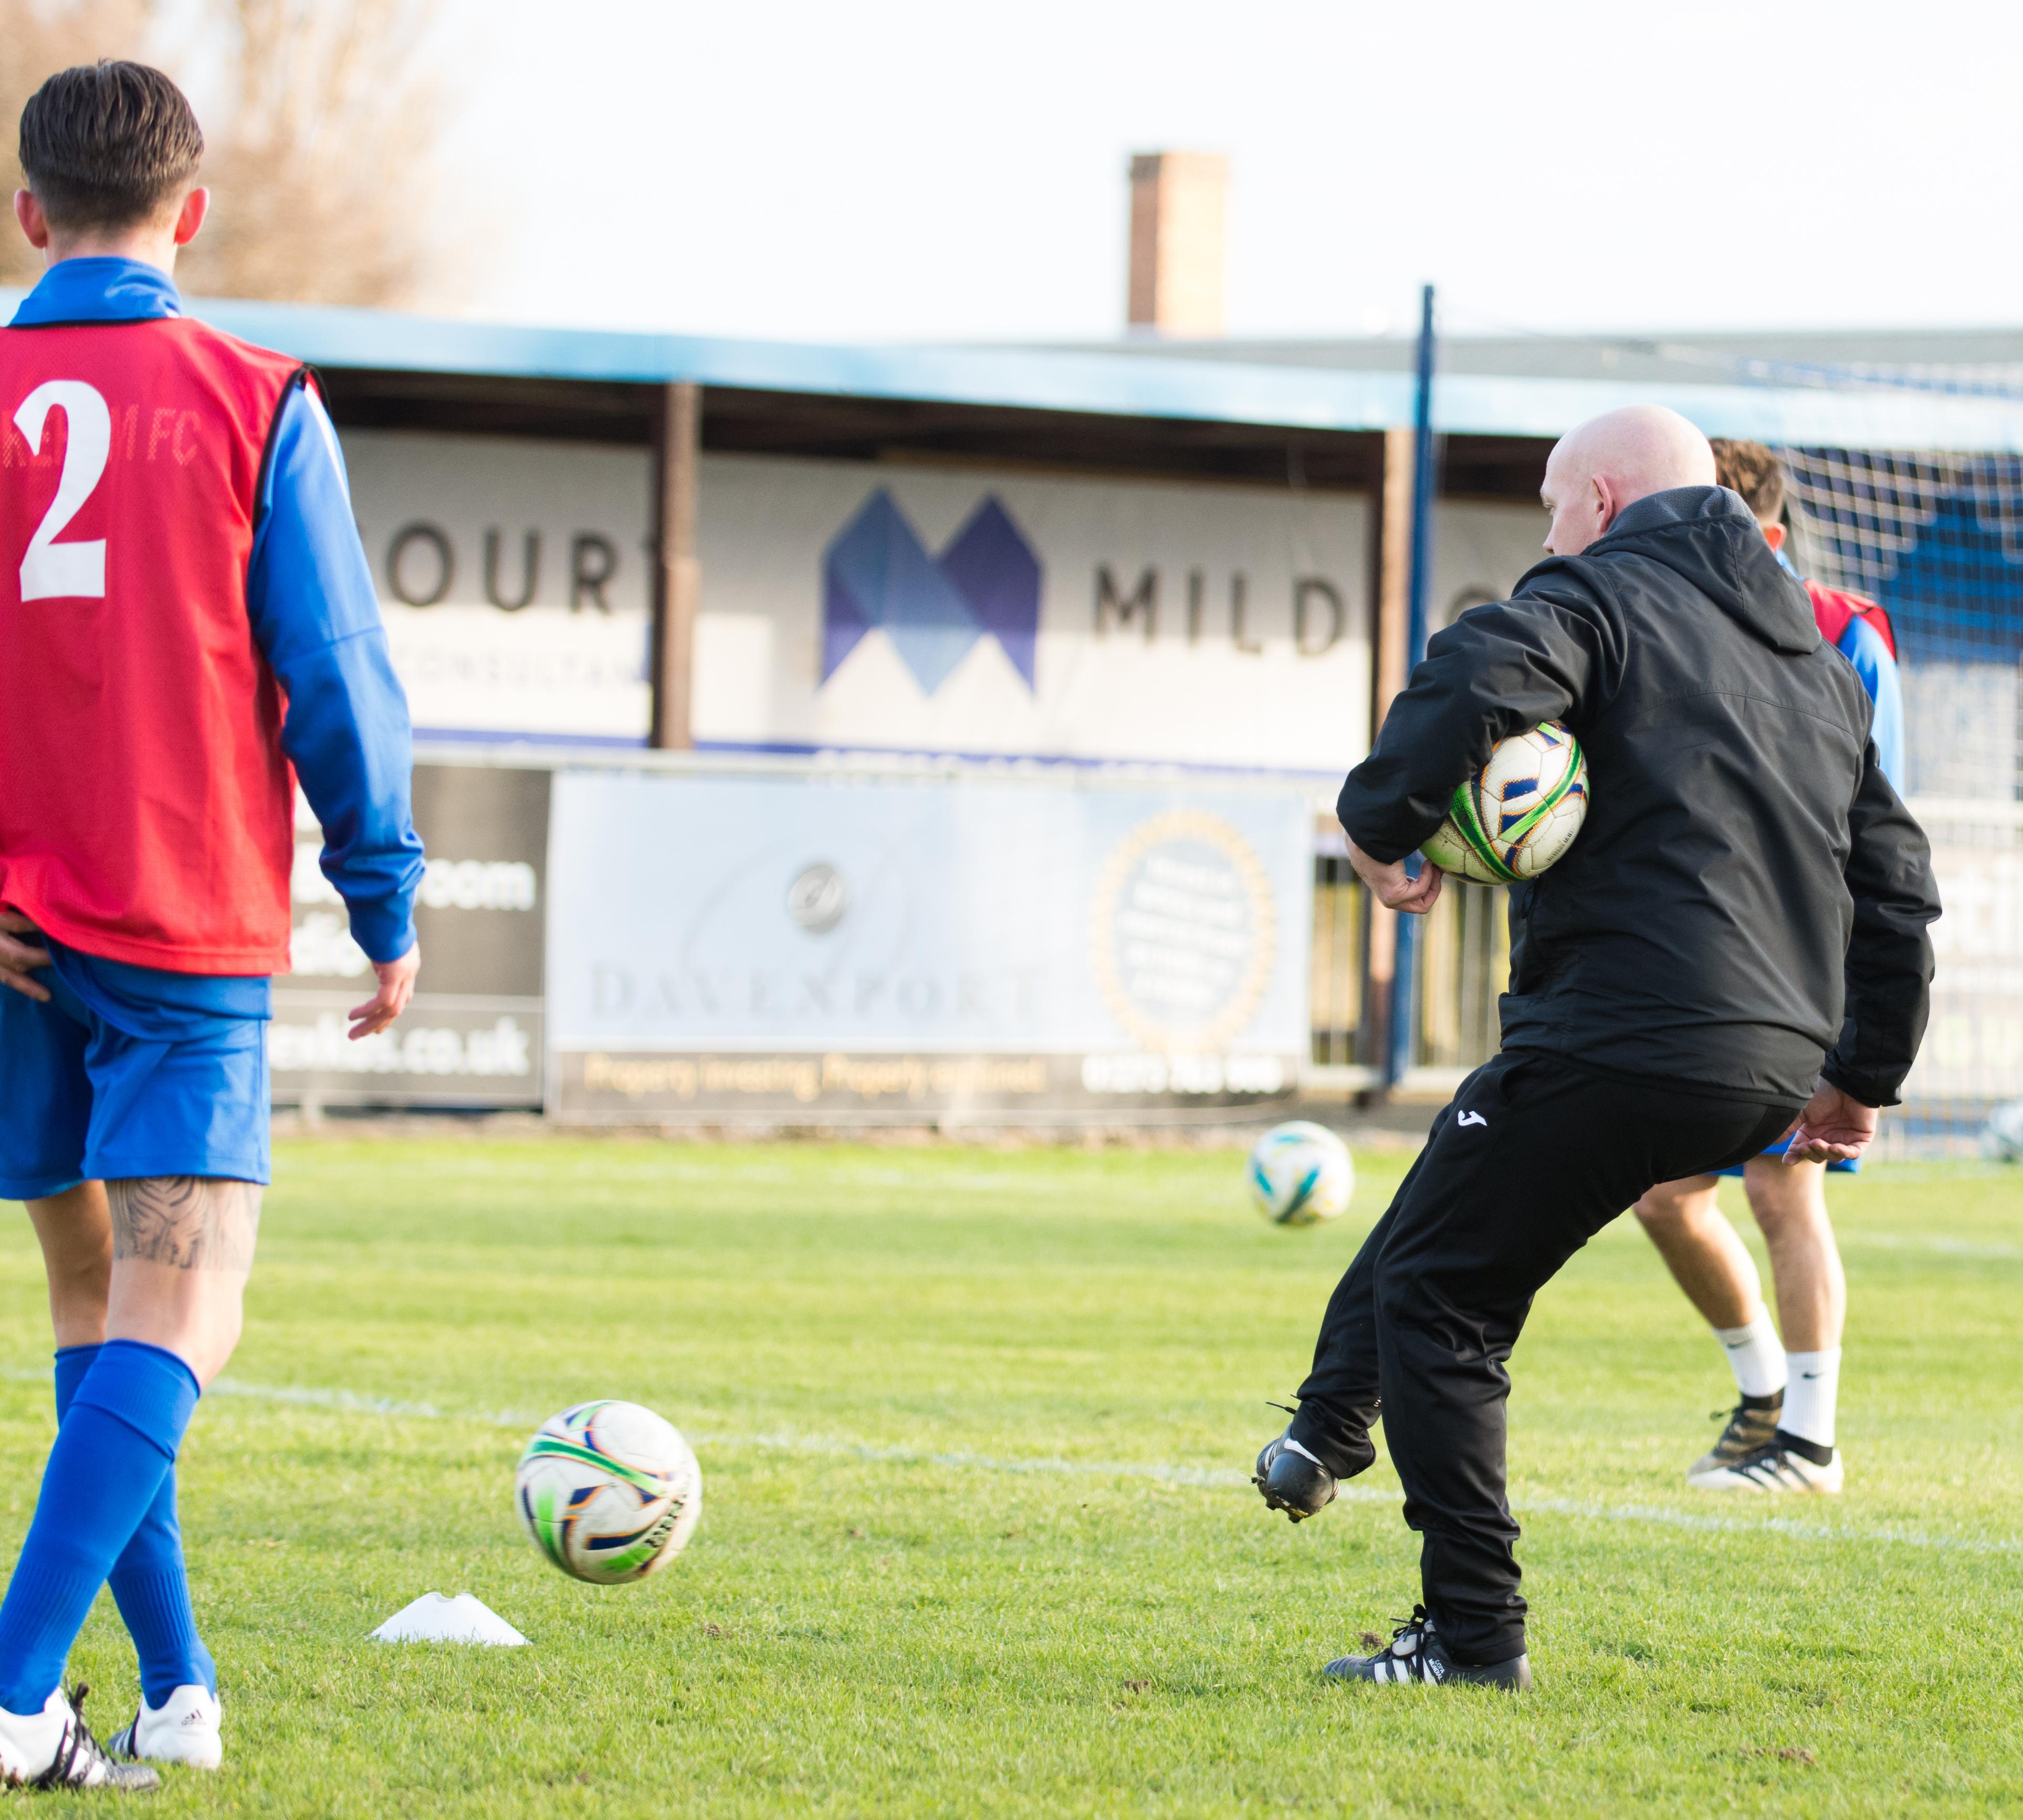 Shoreham FC vs Molesey FC 02.12.17 18